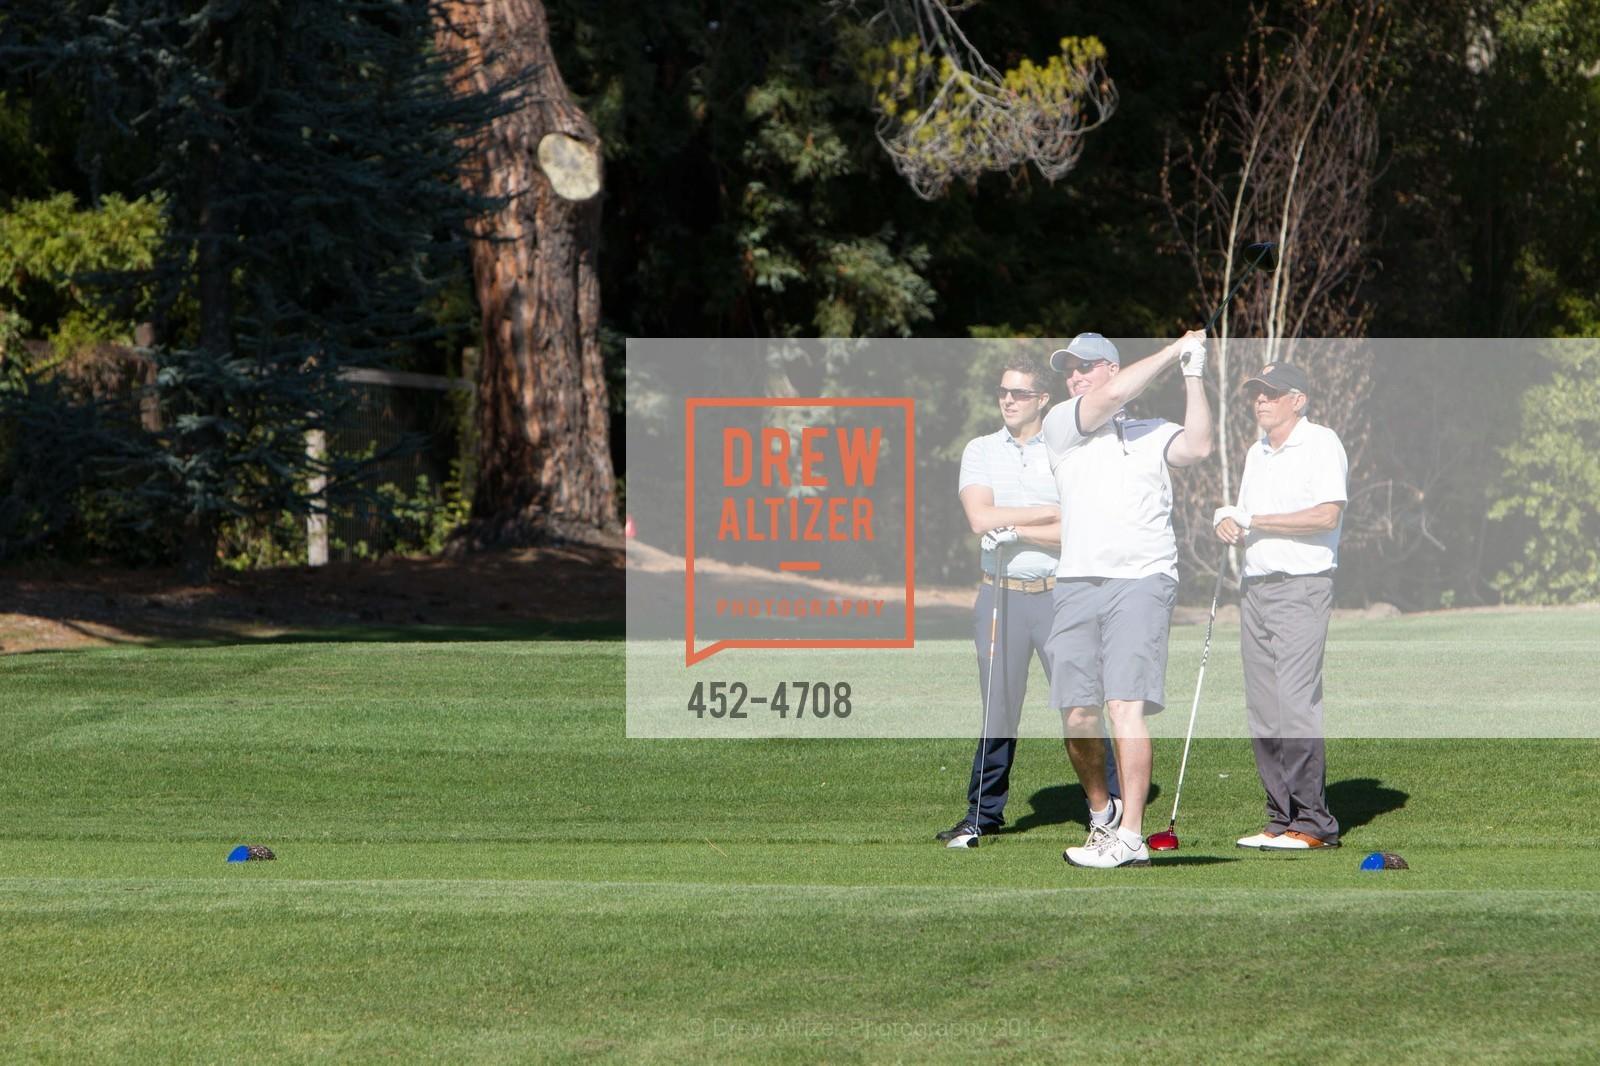 Dan Smith, David Perrez, Chris Dunn, Photo #452-4708